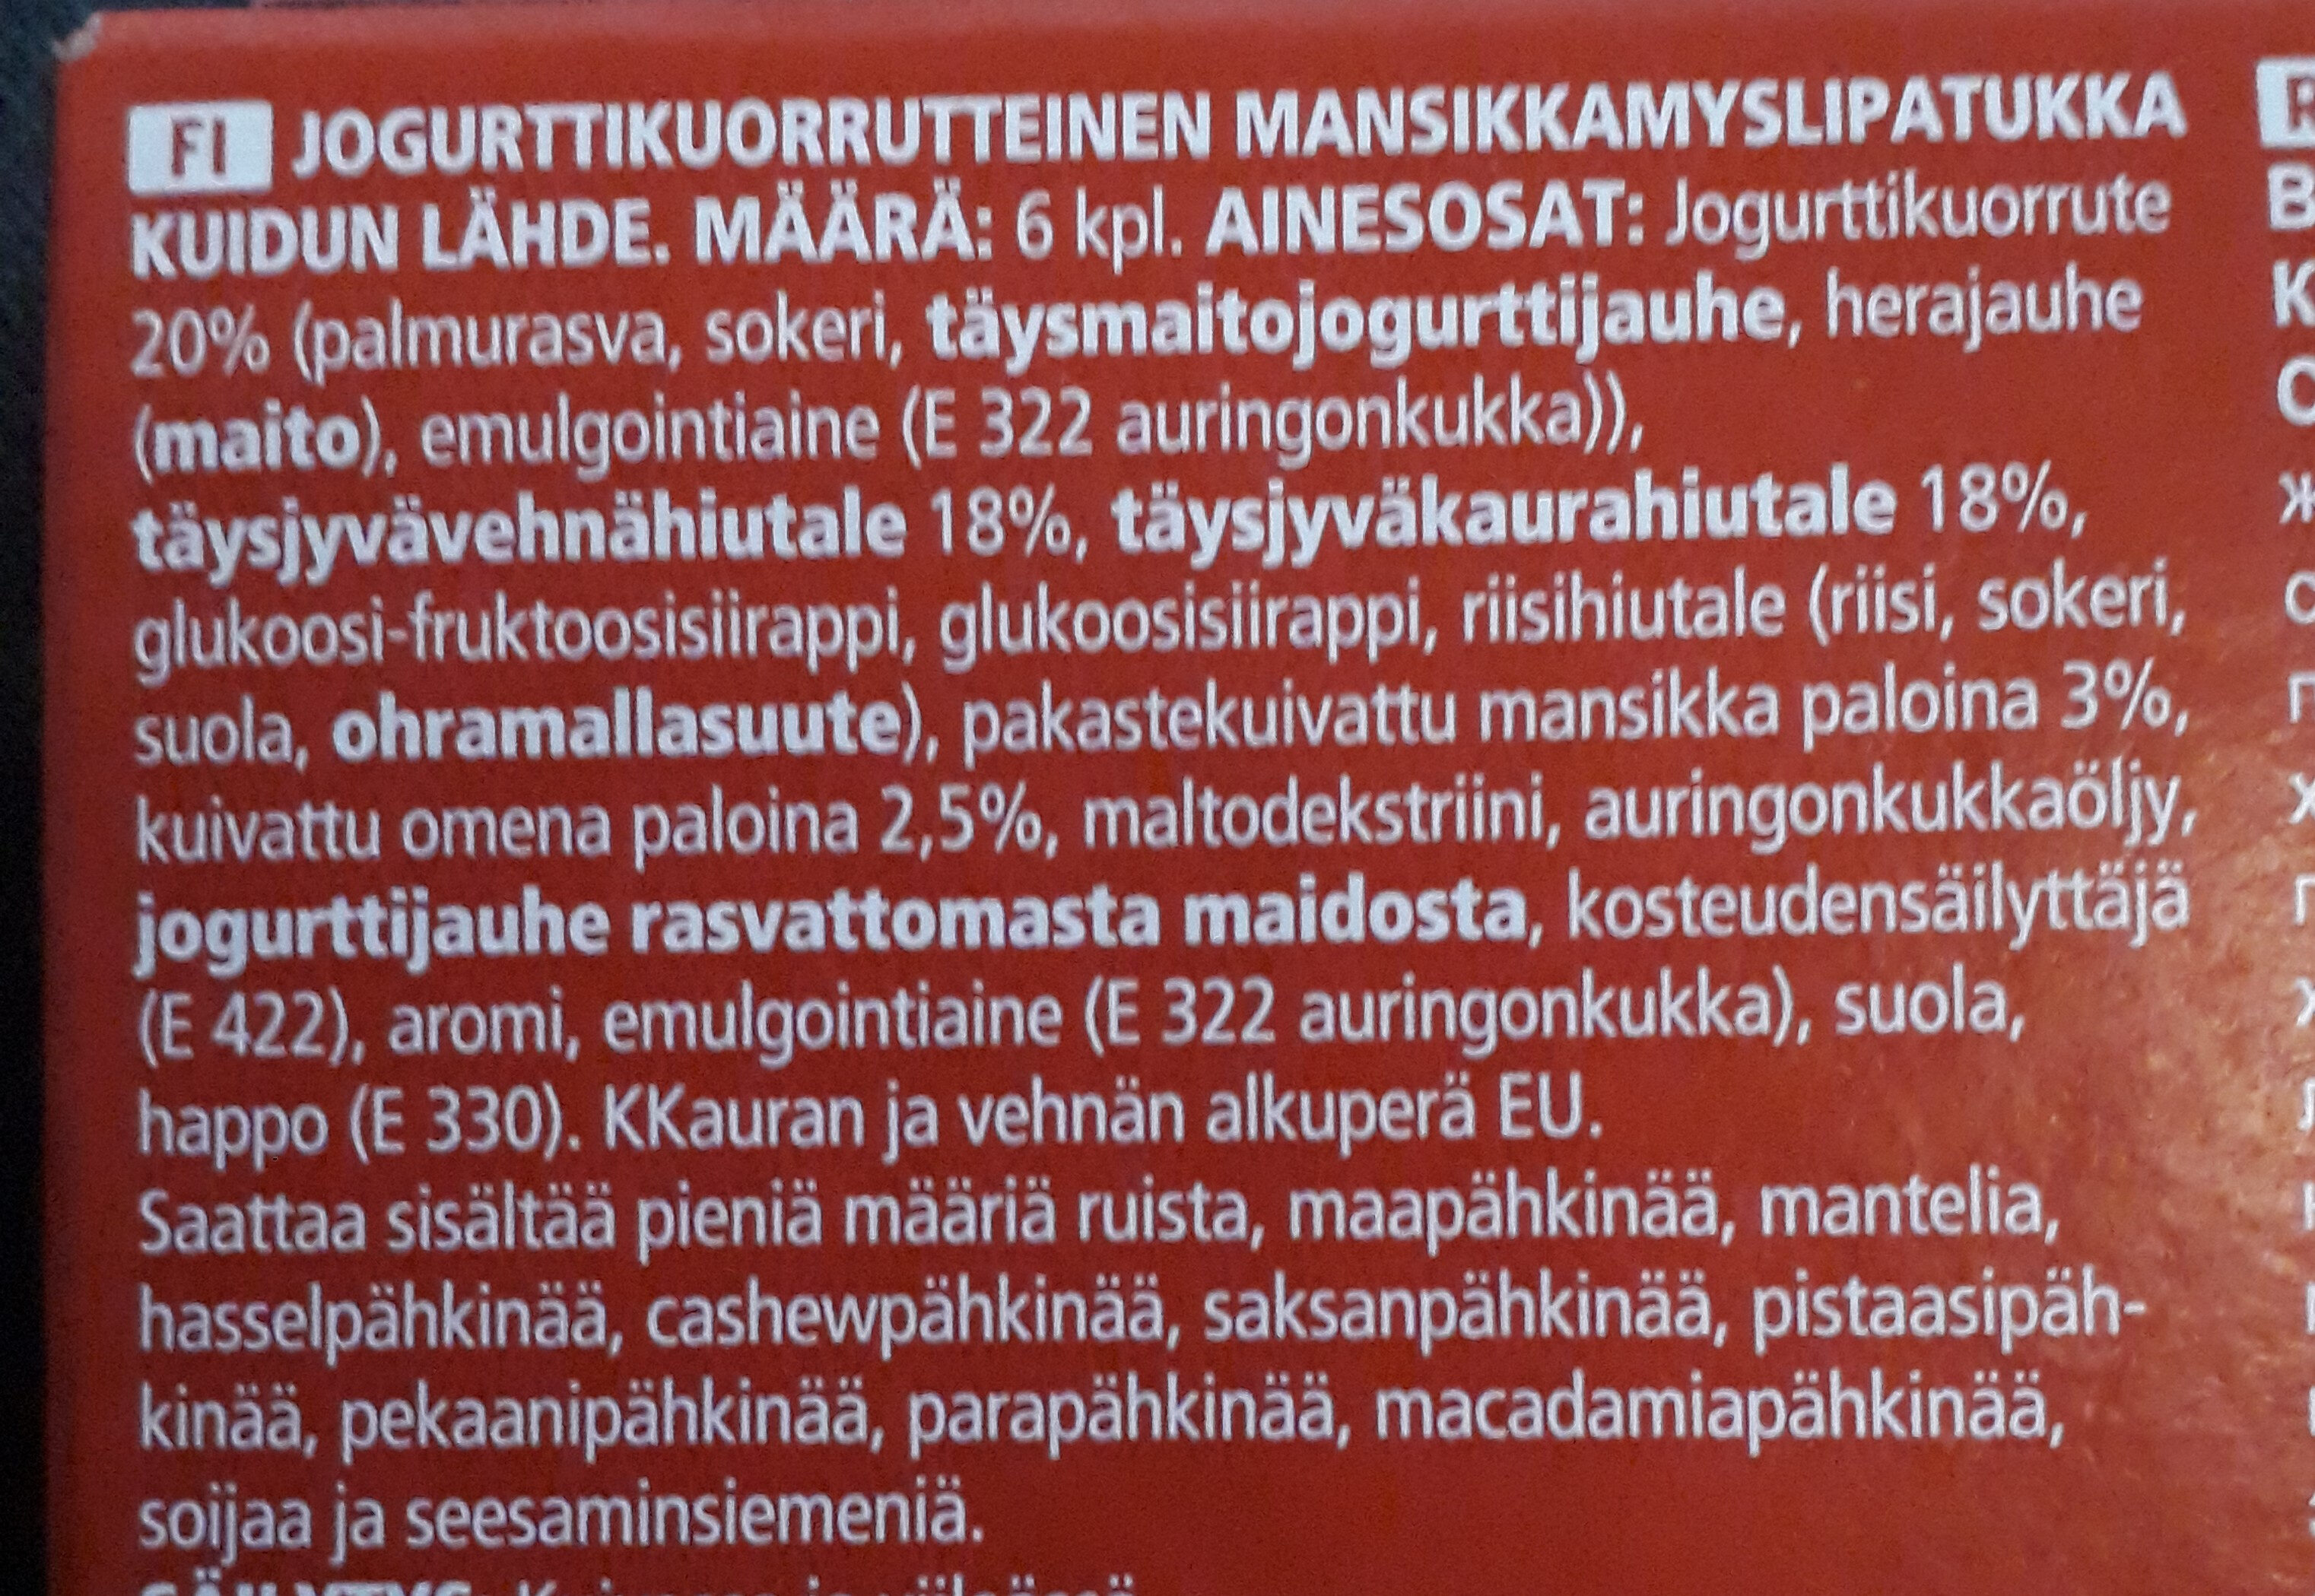 Jogurtti-mansikkamyslipatukka - Ingredients - fi